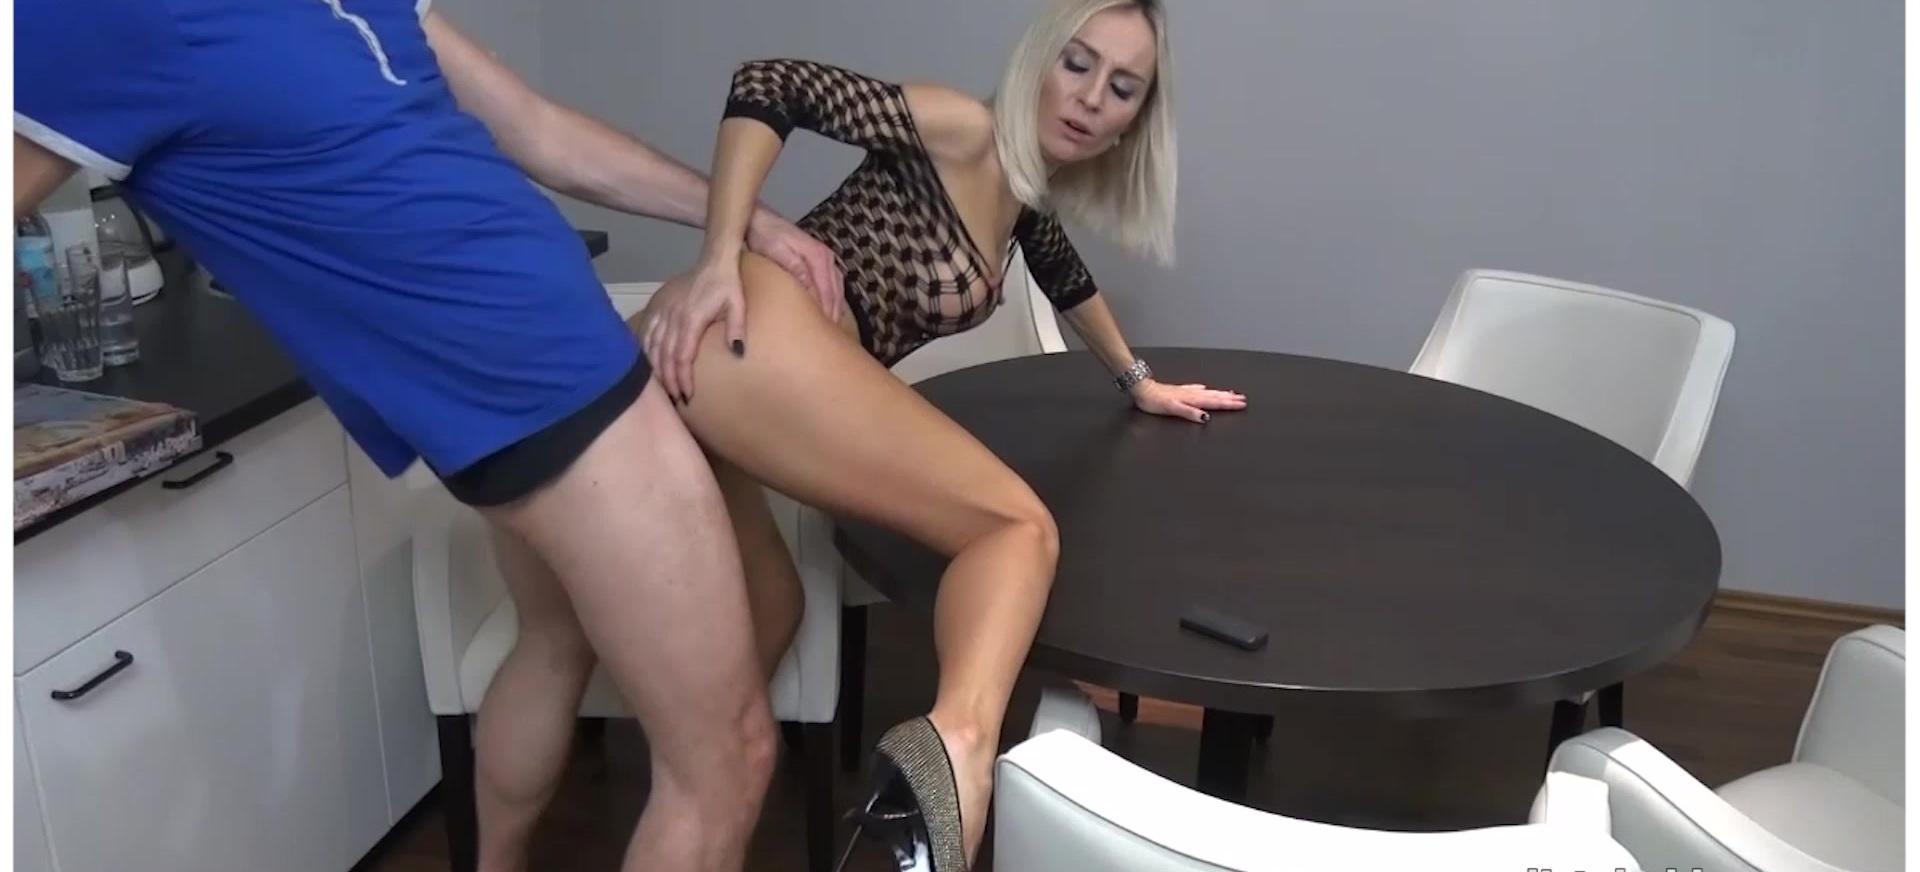 My Dirty Hobby - Alexa Mac laesst sich in der Kueche rannehmen